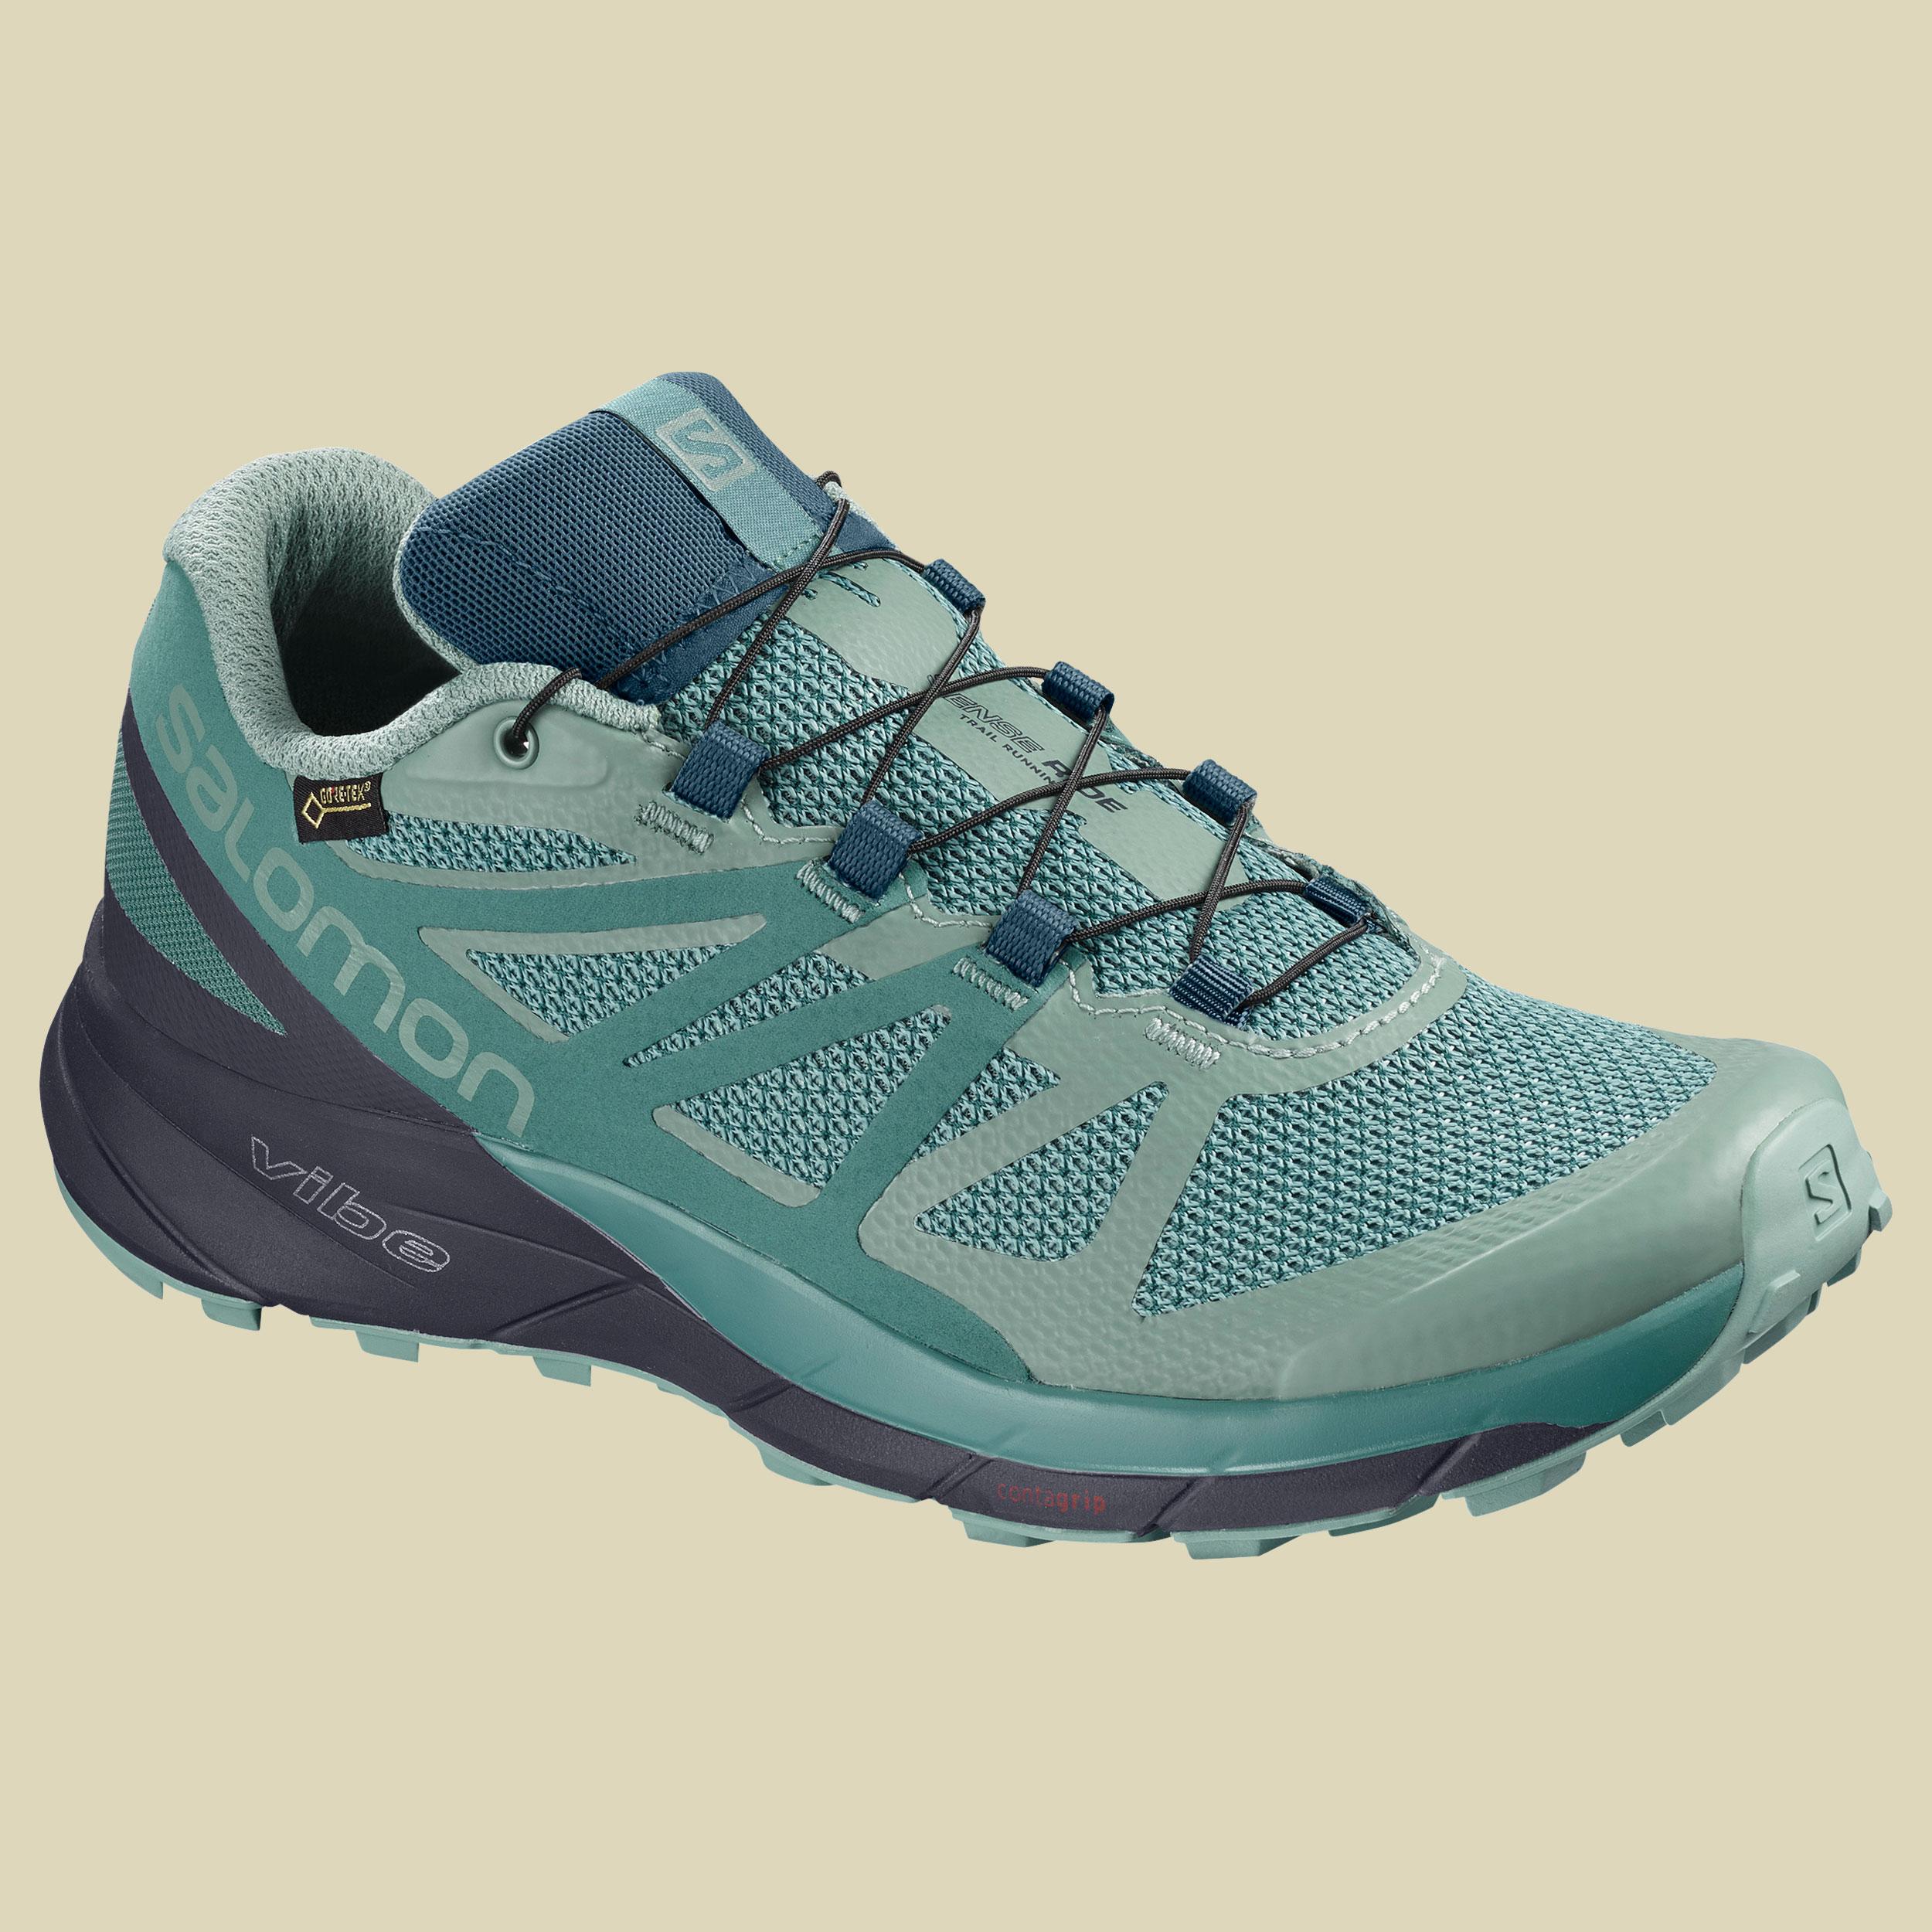 Salomon Sense Ride GTX Invisible Fit Women Damen Laufschuh Größe UK 4 trellis/graphite